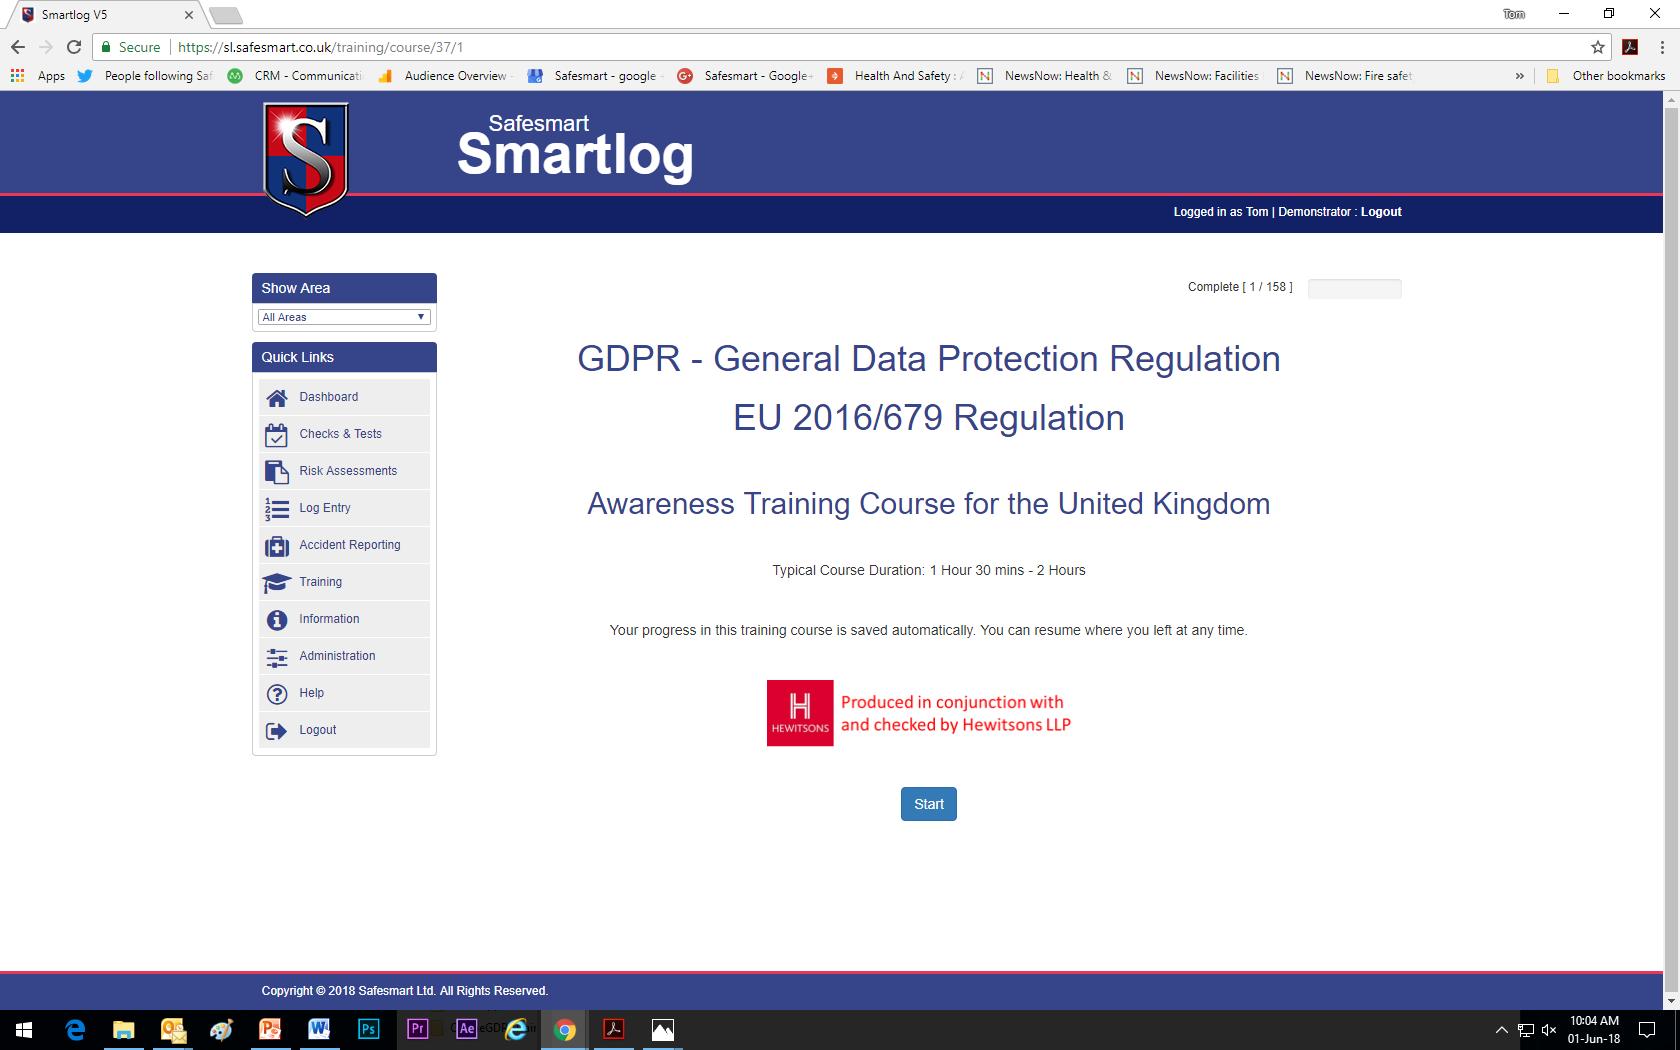 Online GDPR Training - Safesmart